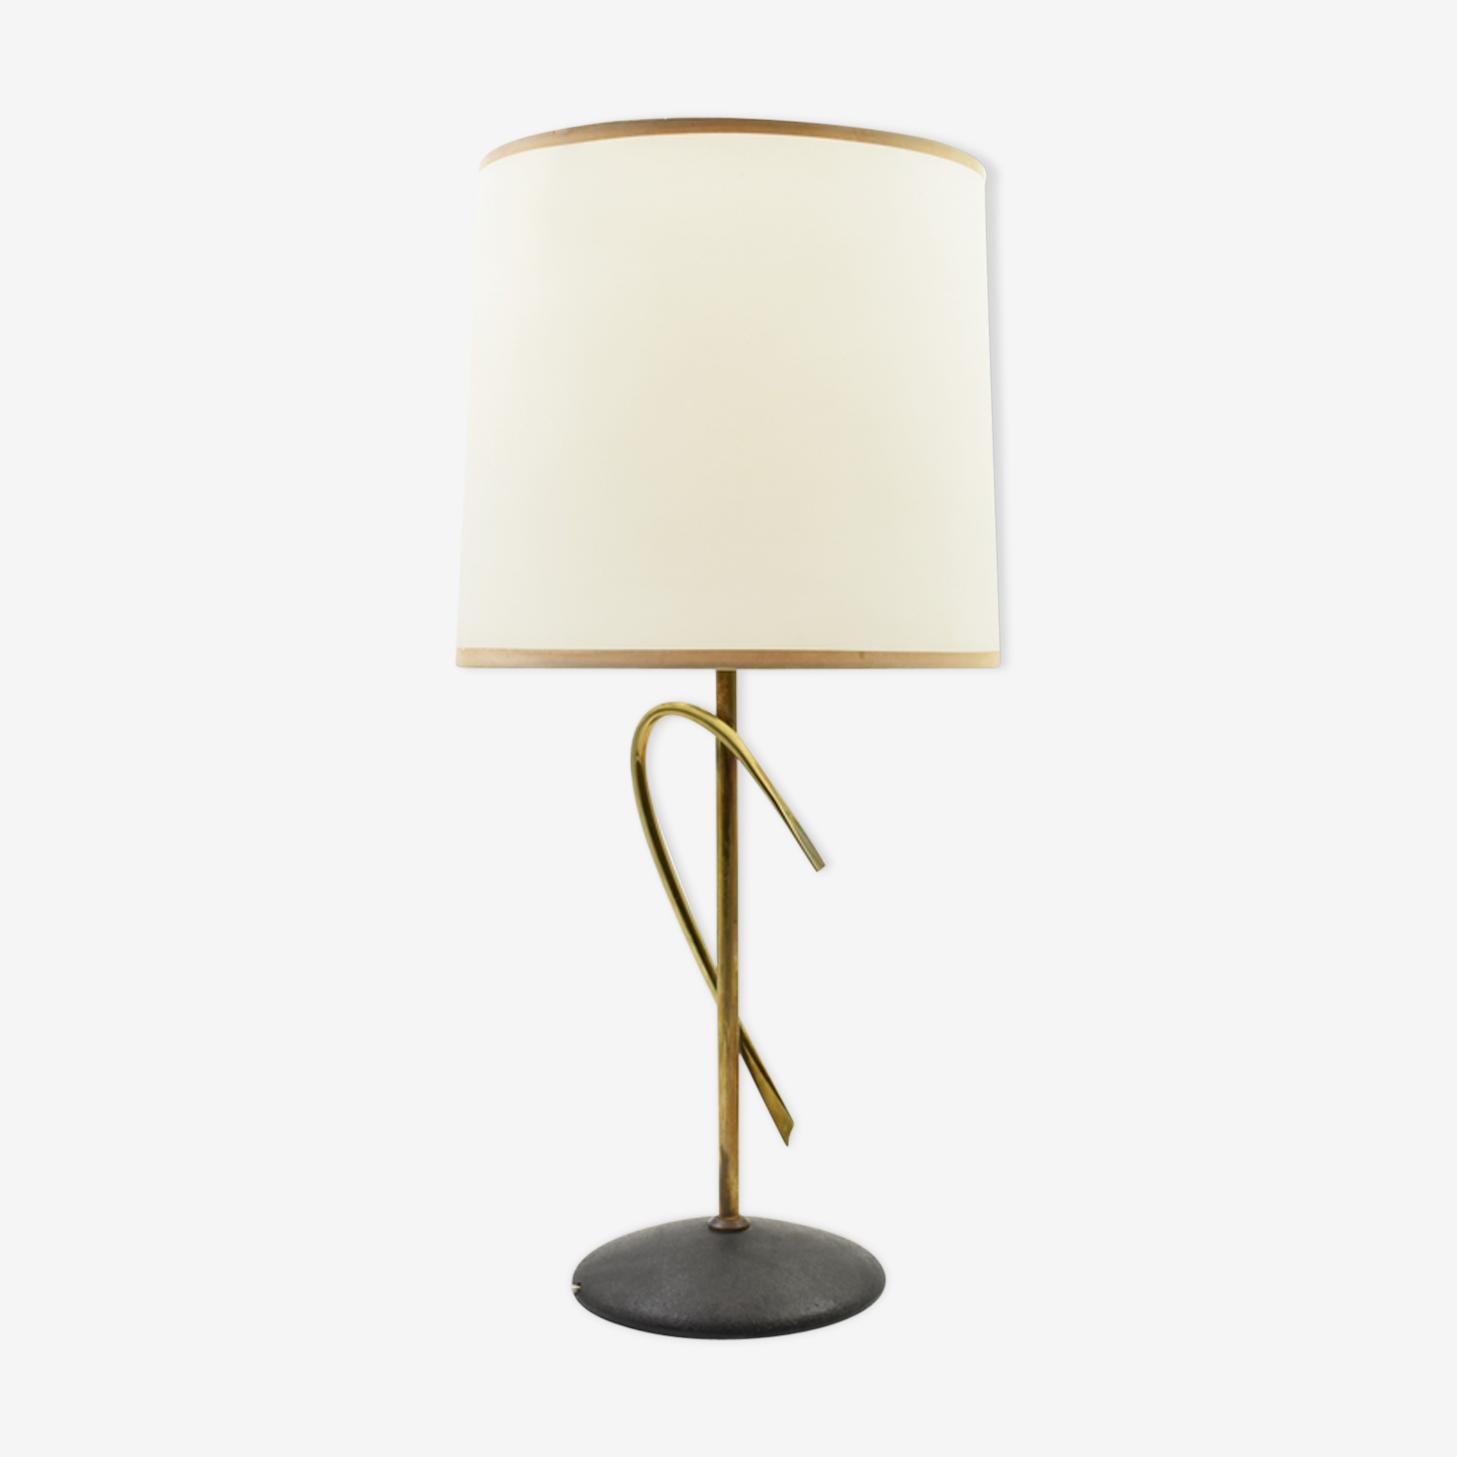 Lampe Sculpture abstraite 1950 Arlus